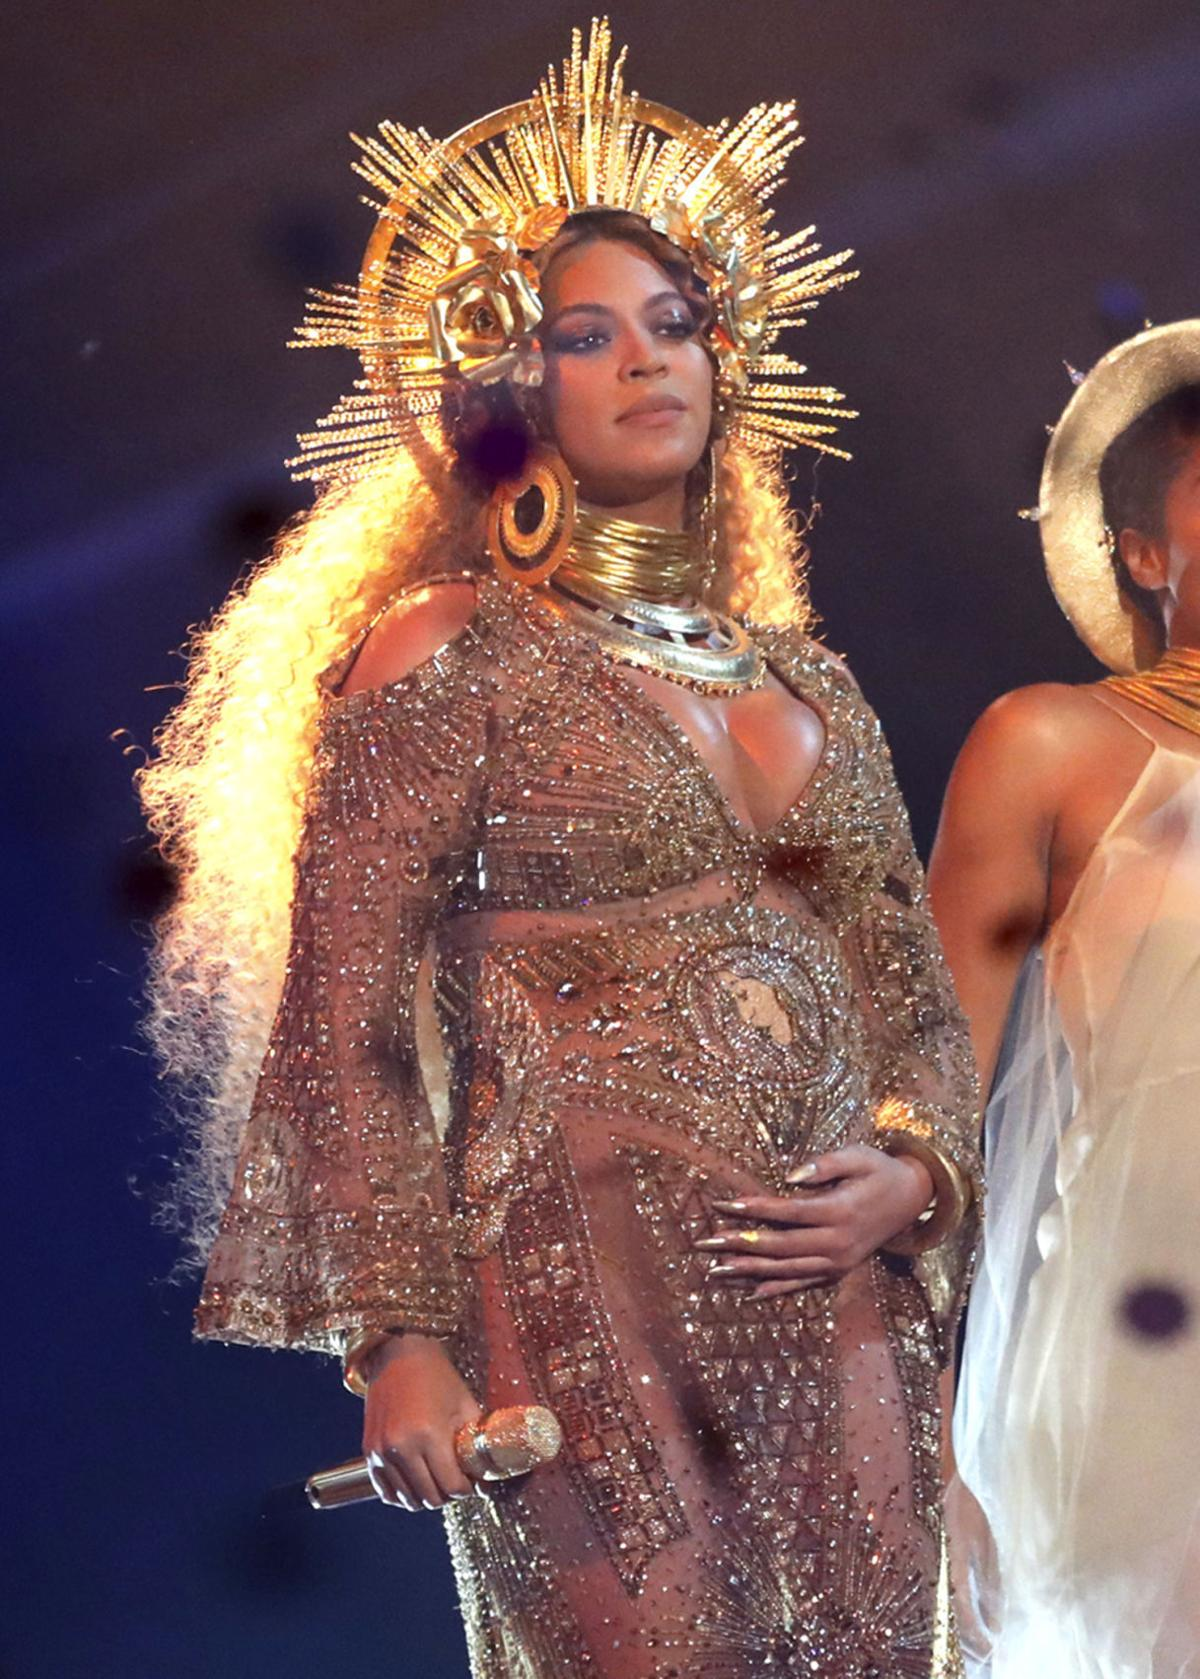 c6918d670c9 A look back at Grammy fashion through the decades